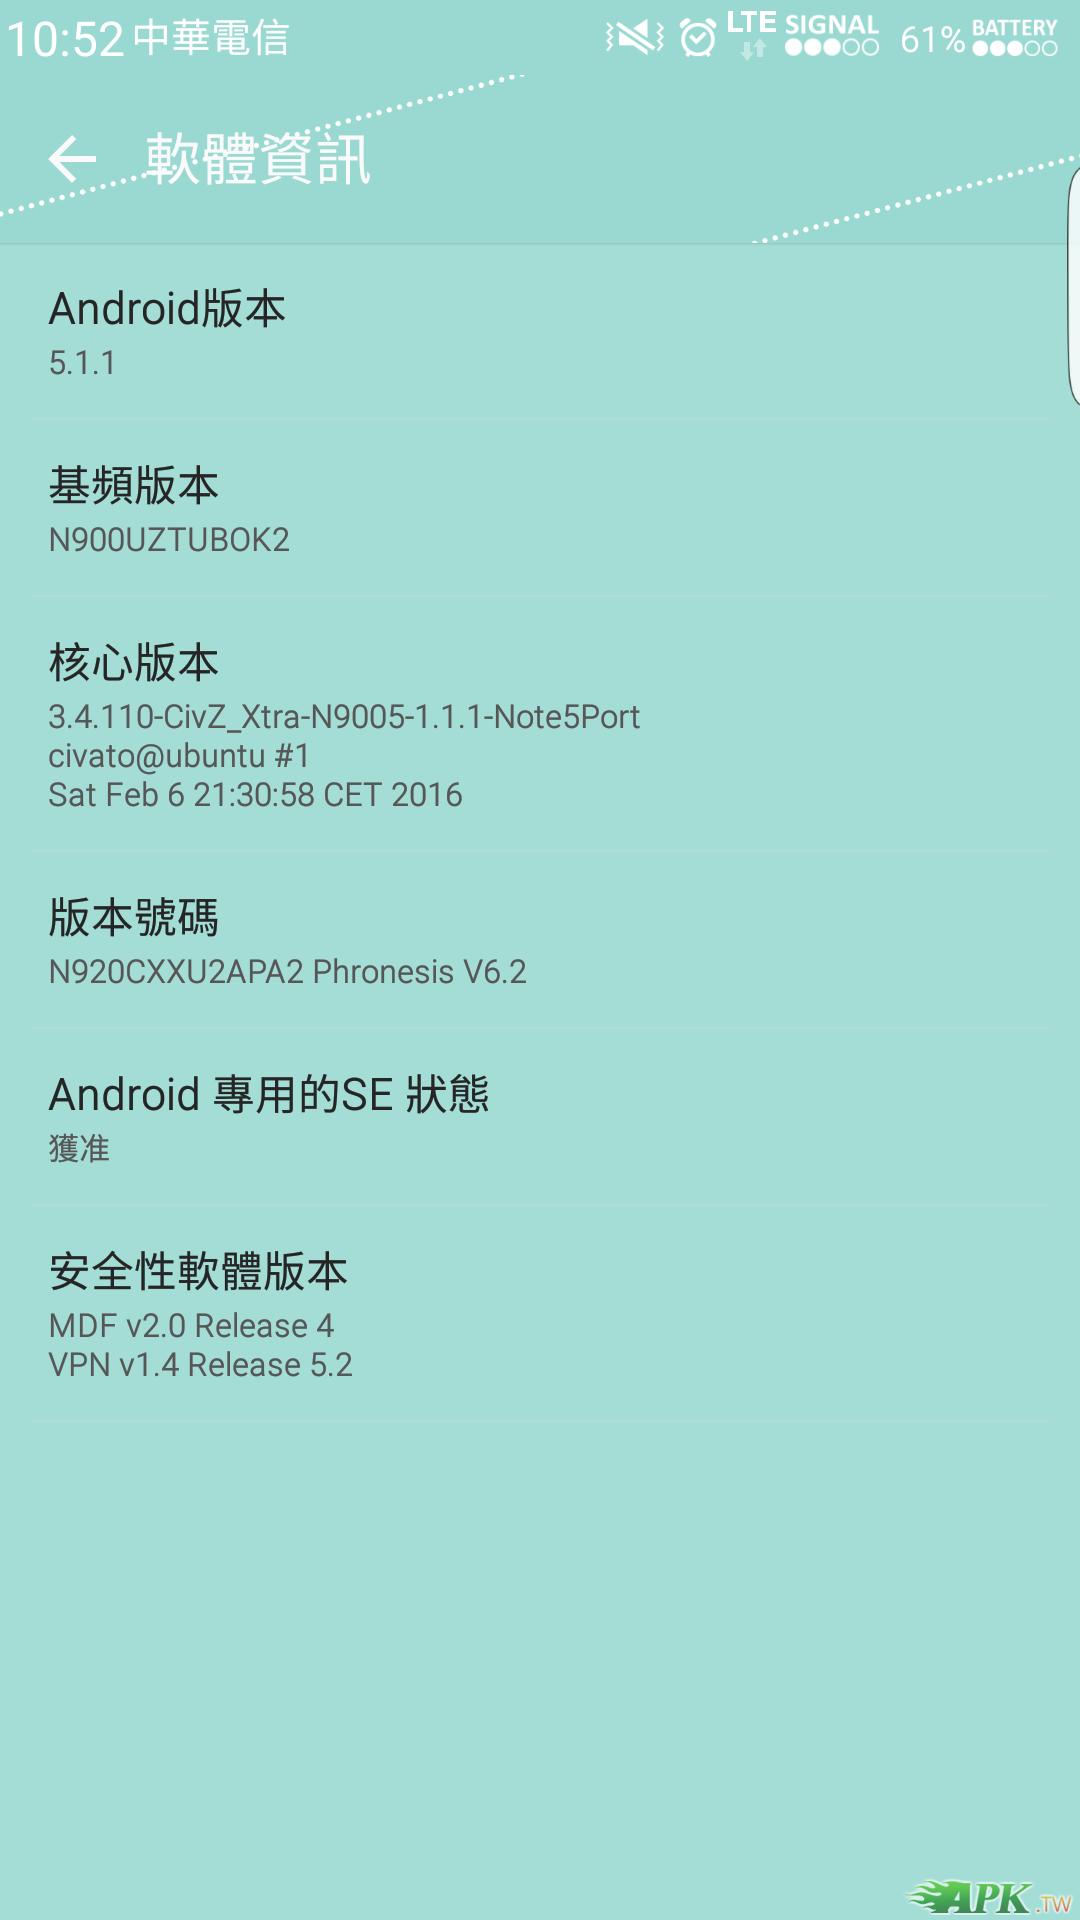 Screenshot_2016-06-14-10-52-28.png